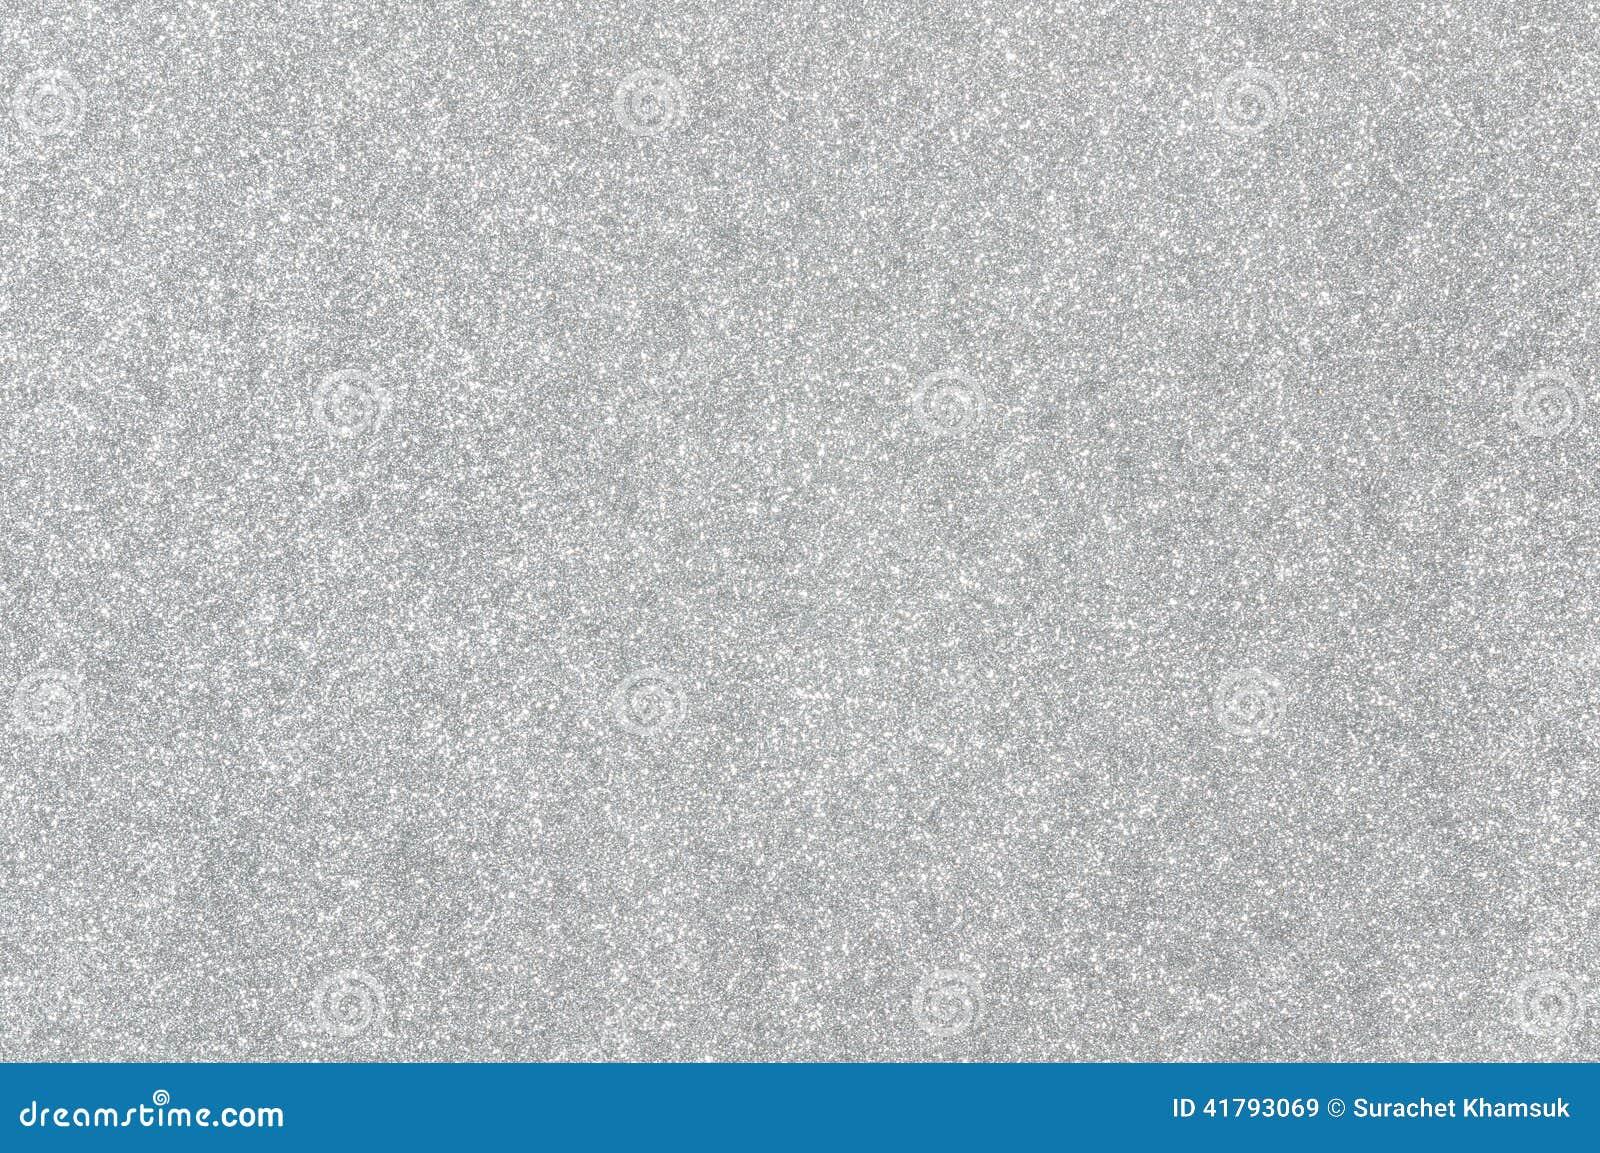 Silver glitter texture background